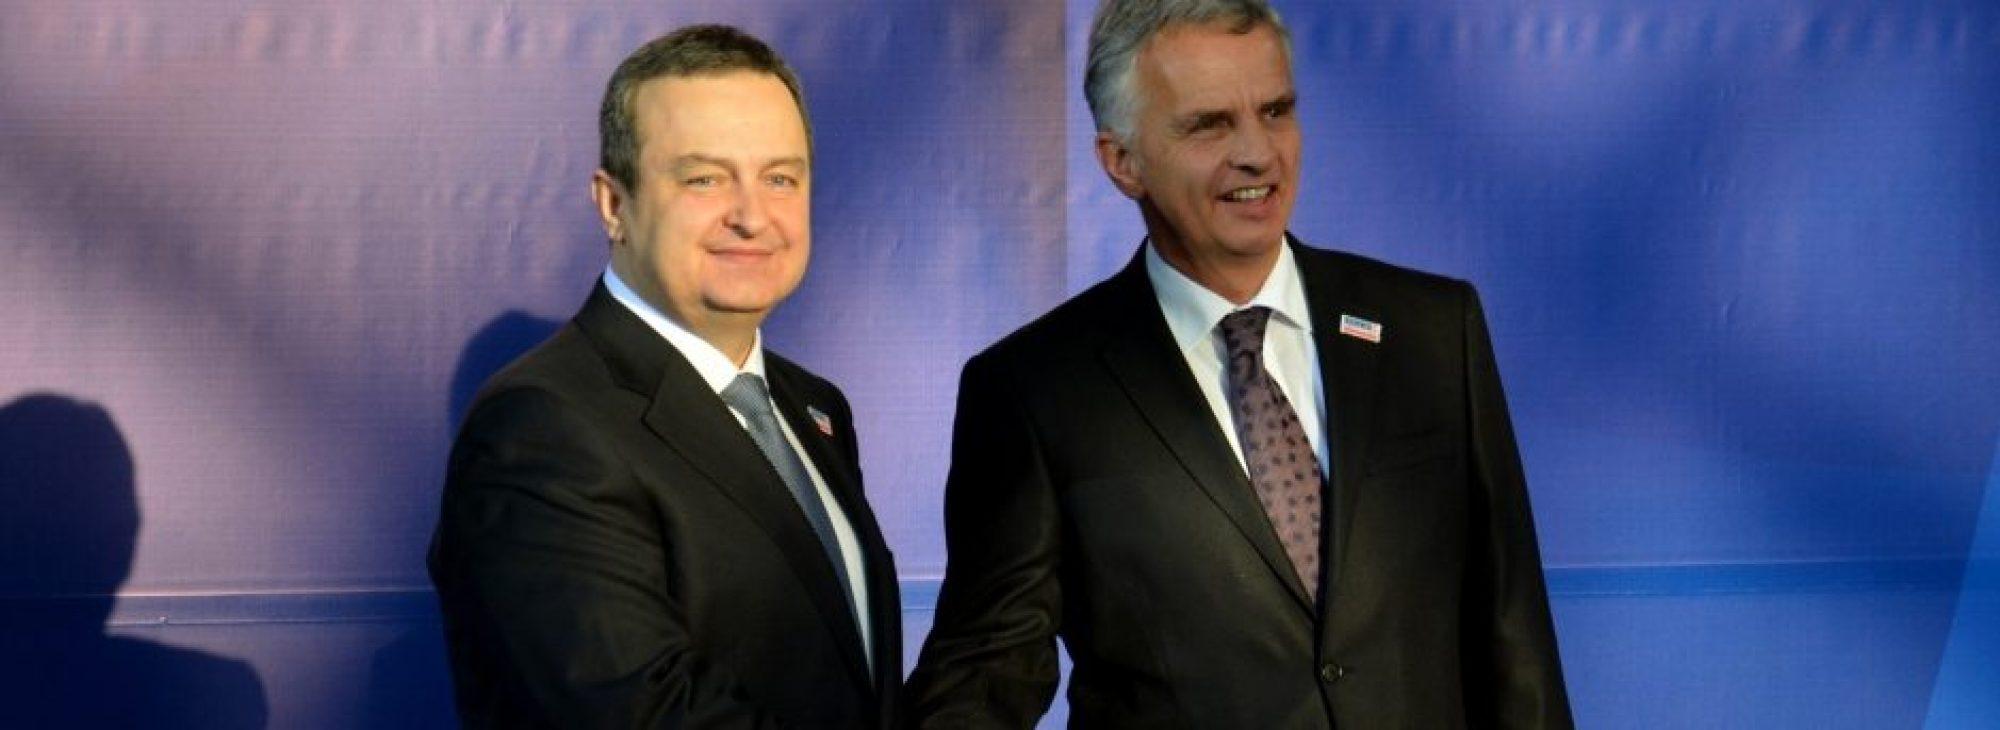 in switzerland s shadow summing up serbia s 2015 osce chairmanship